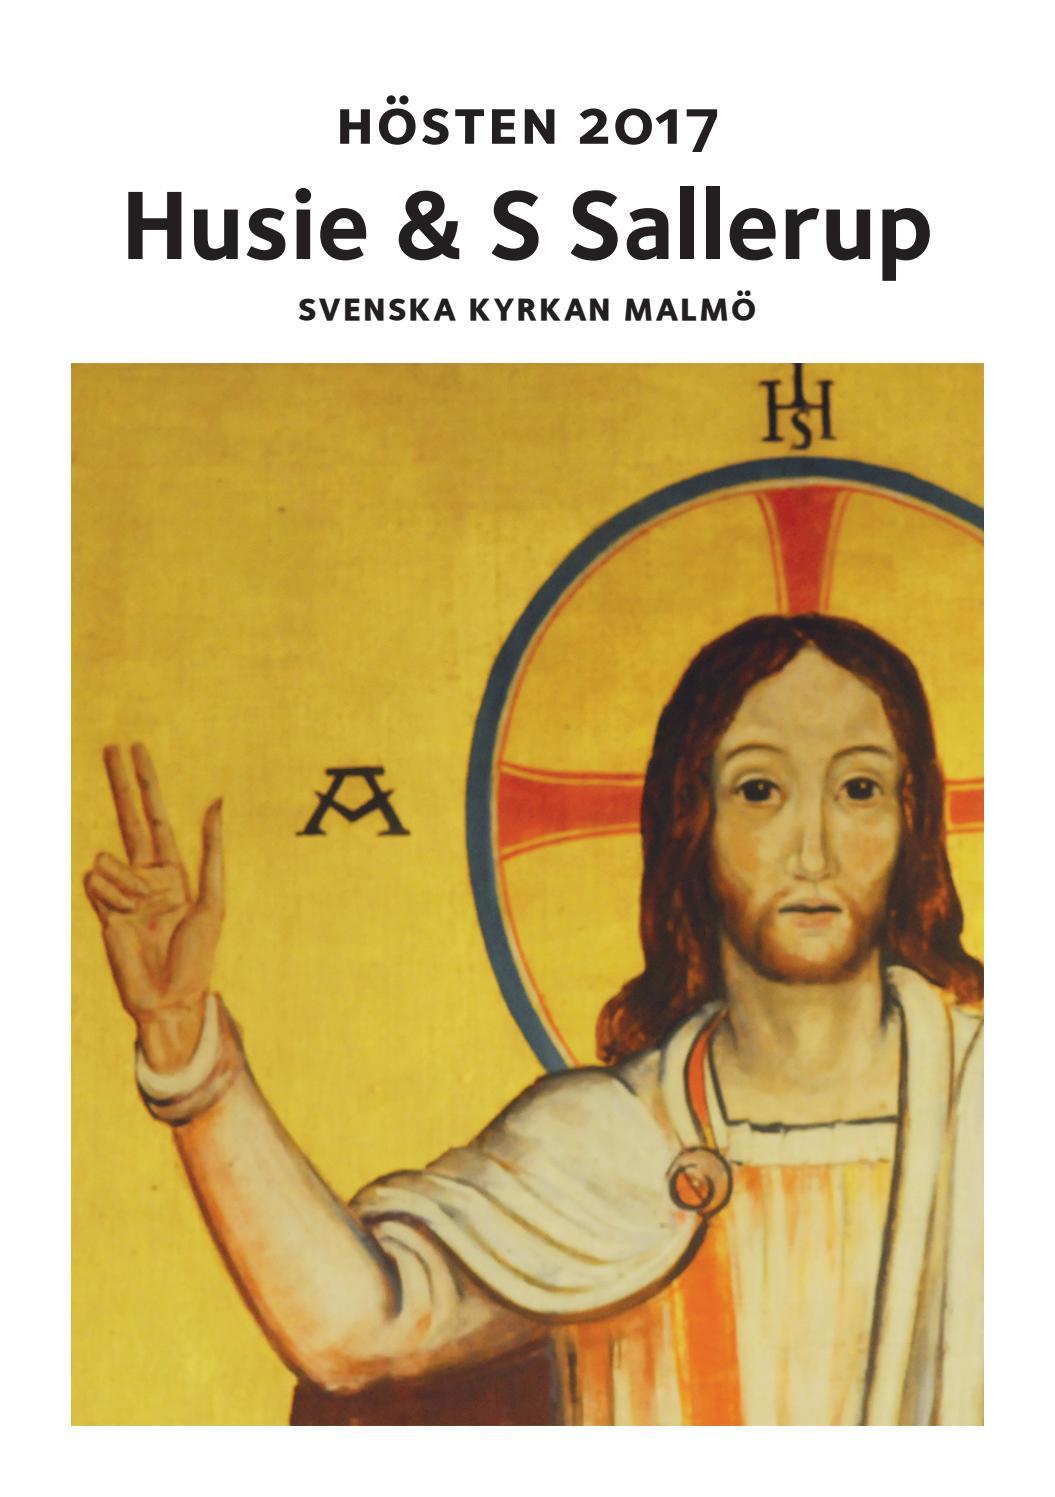 Kyrkoblad Husie och S Sallerups kyrkor vren 2020 by - Issuu